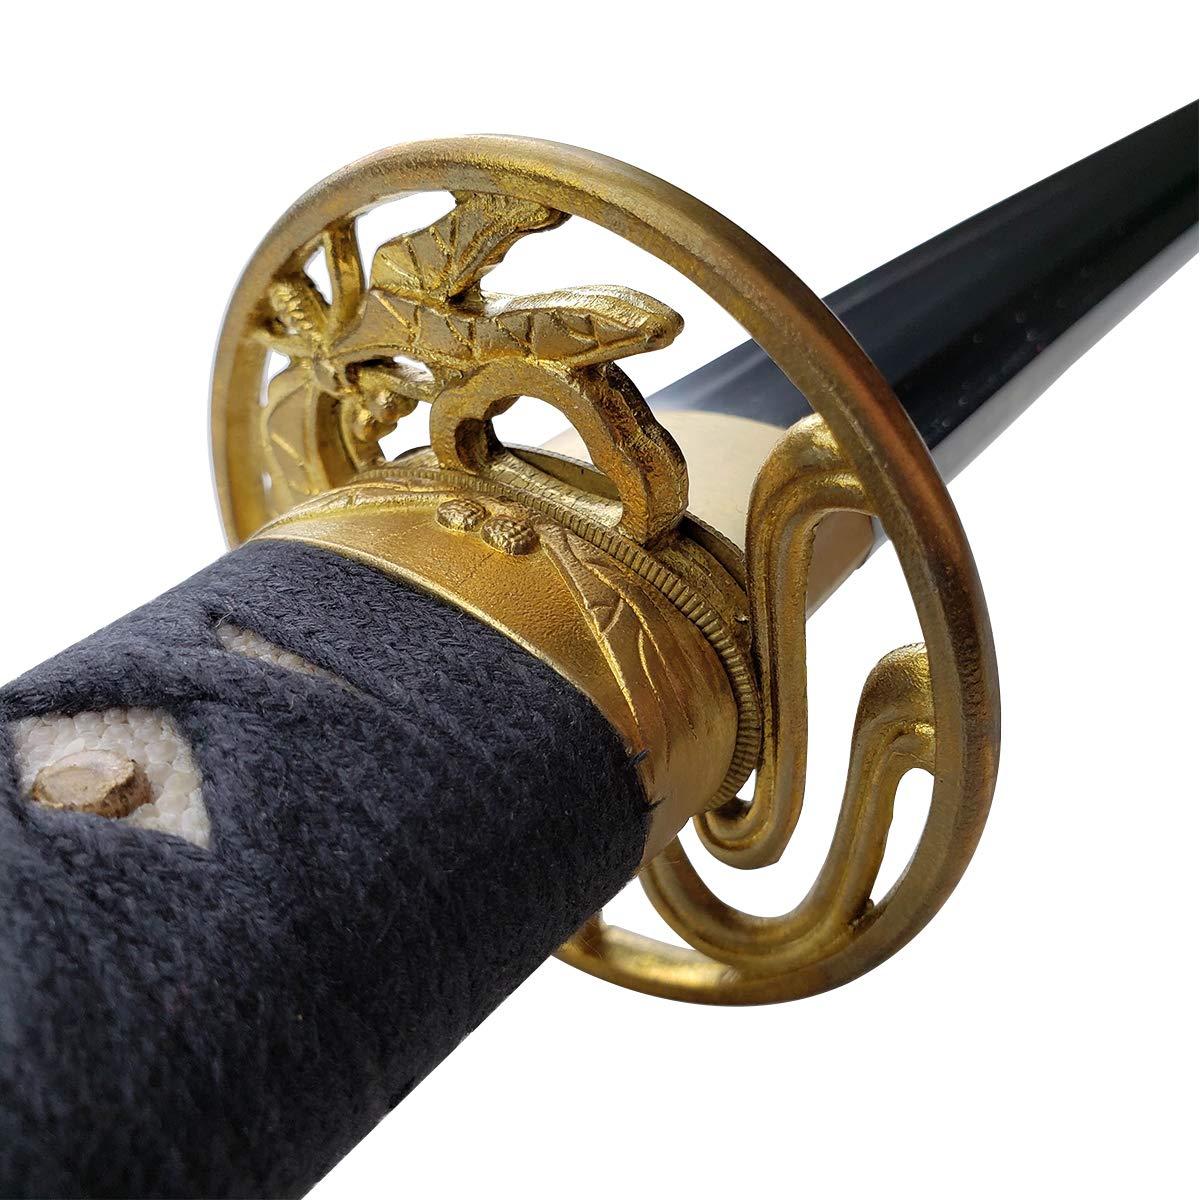 Musashi Silver Shirakawa Series Hand Forged Gold Dragonfly Katana Samurai Sword - 1060 High Carbon Steel Full Tang Blade for Collection, Gift, Straw Mat Cutting Practice